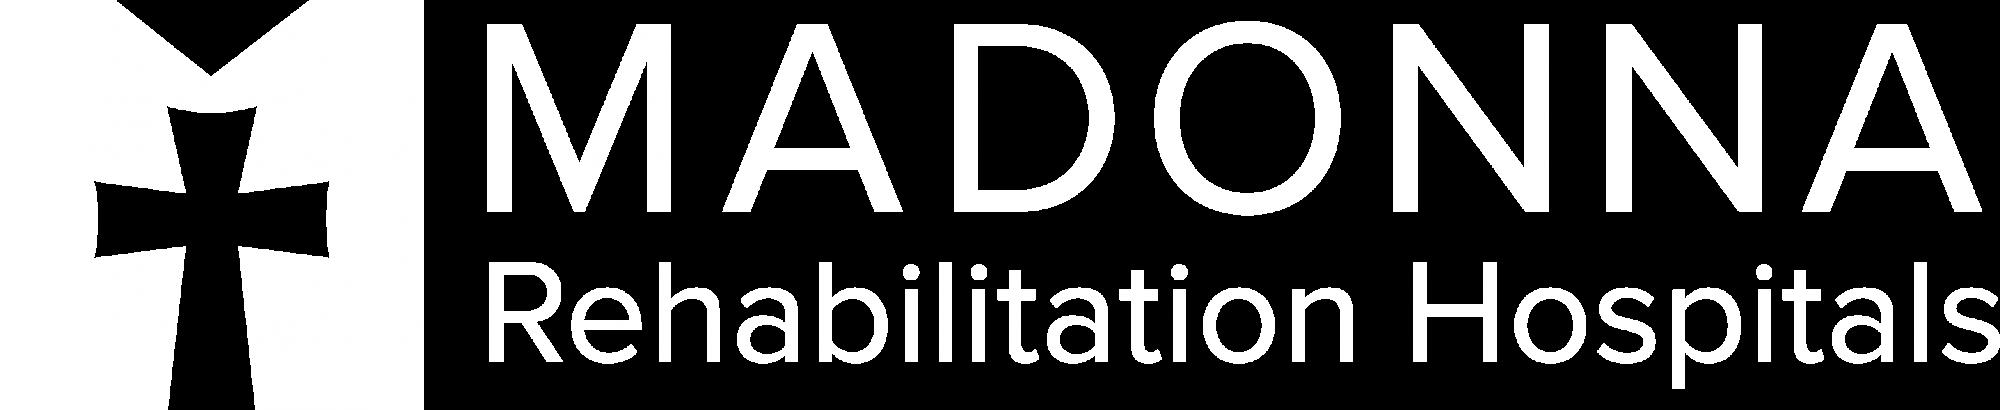 Madonna Rehabilitation Hospitals Logo